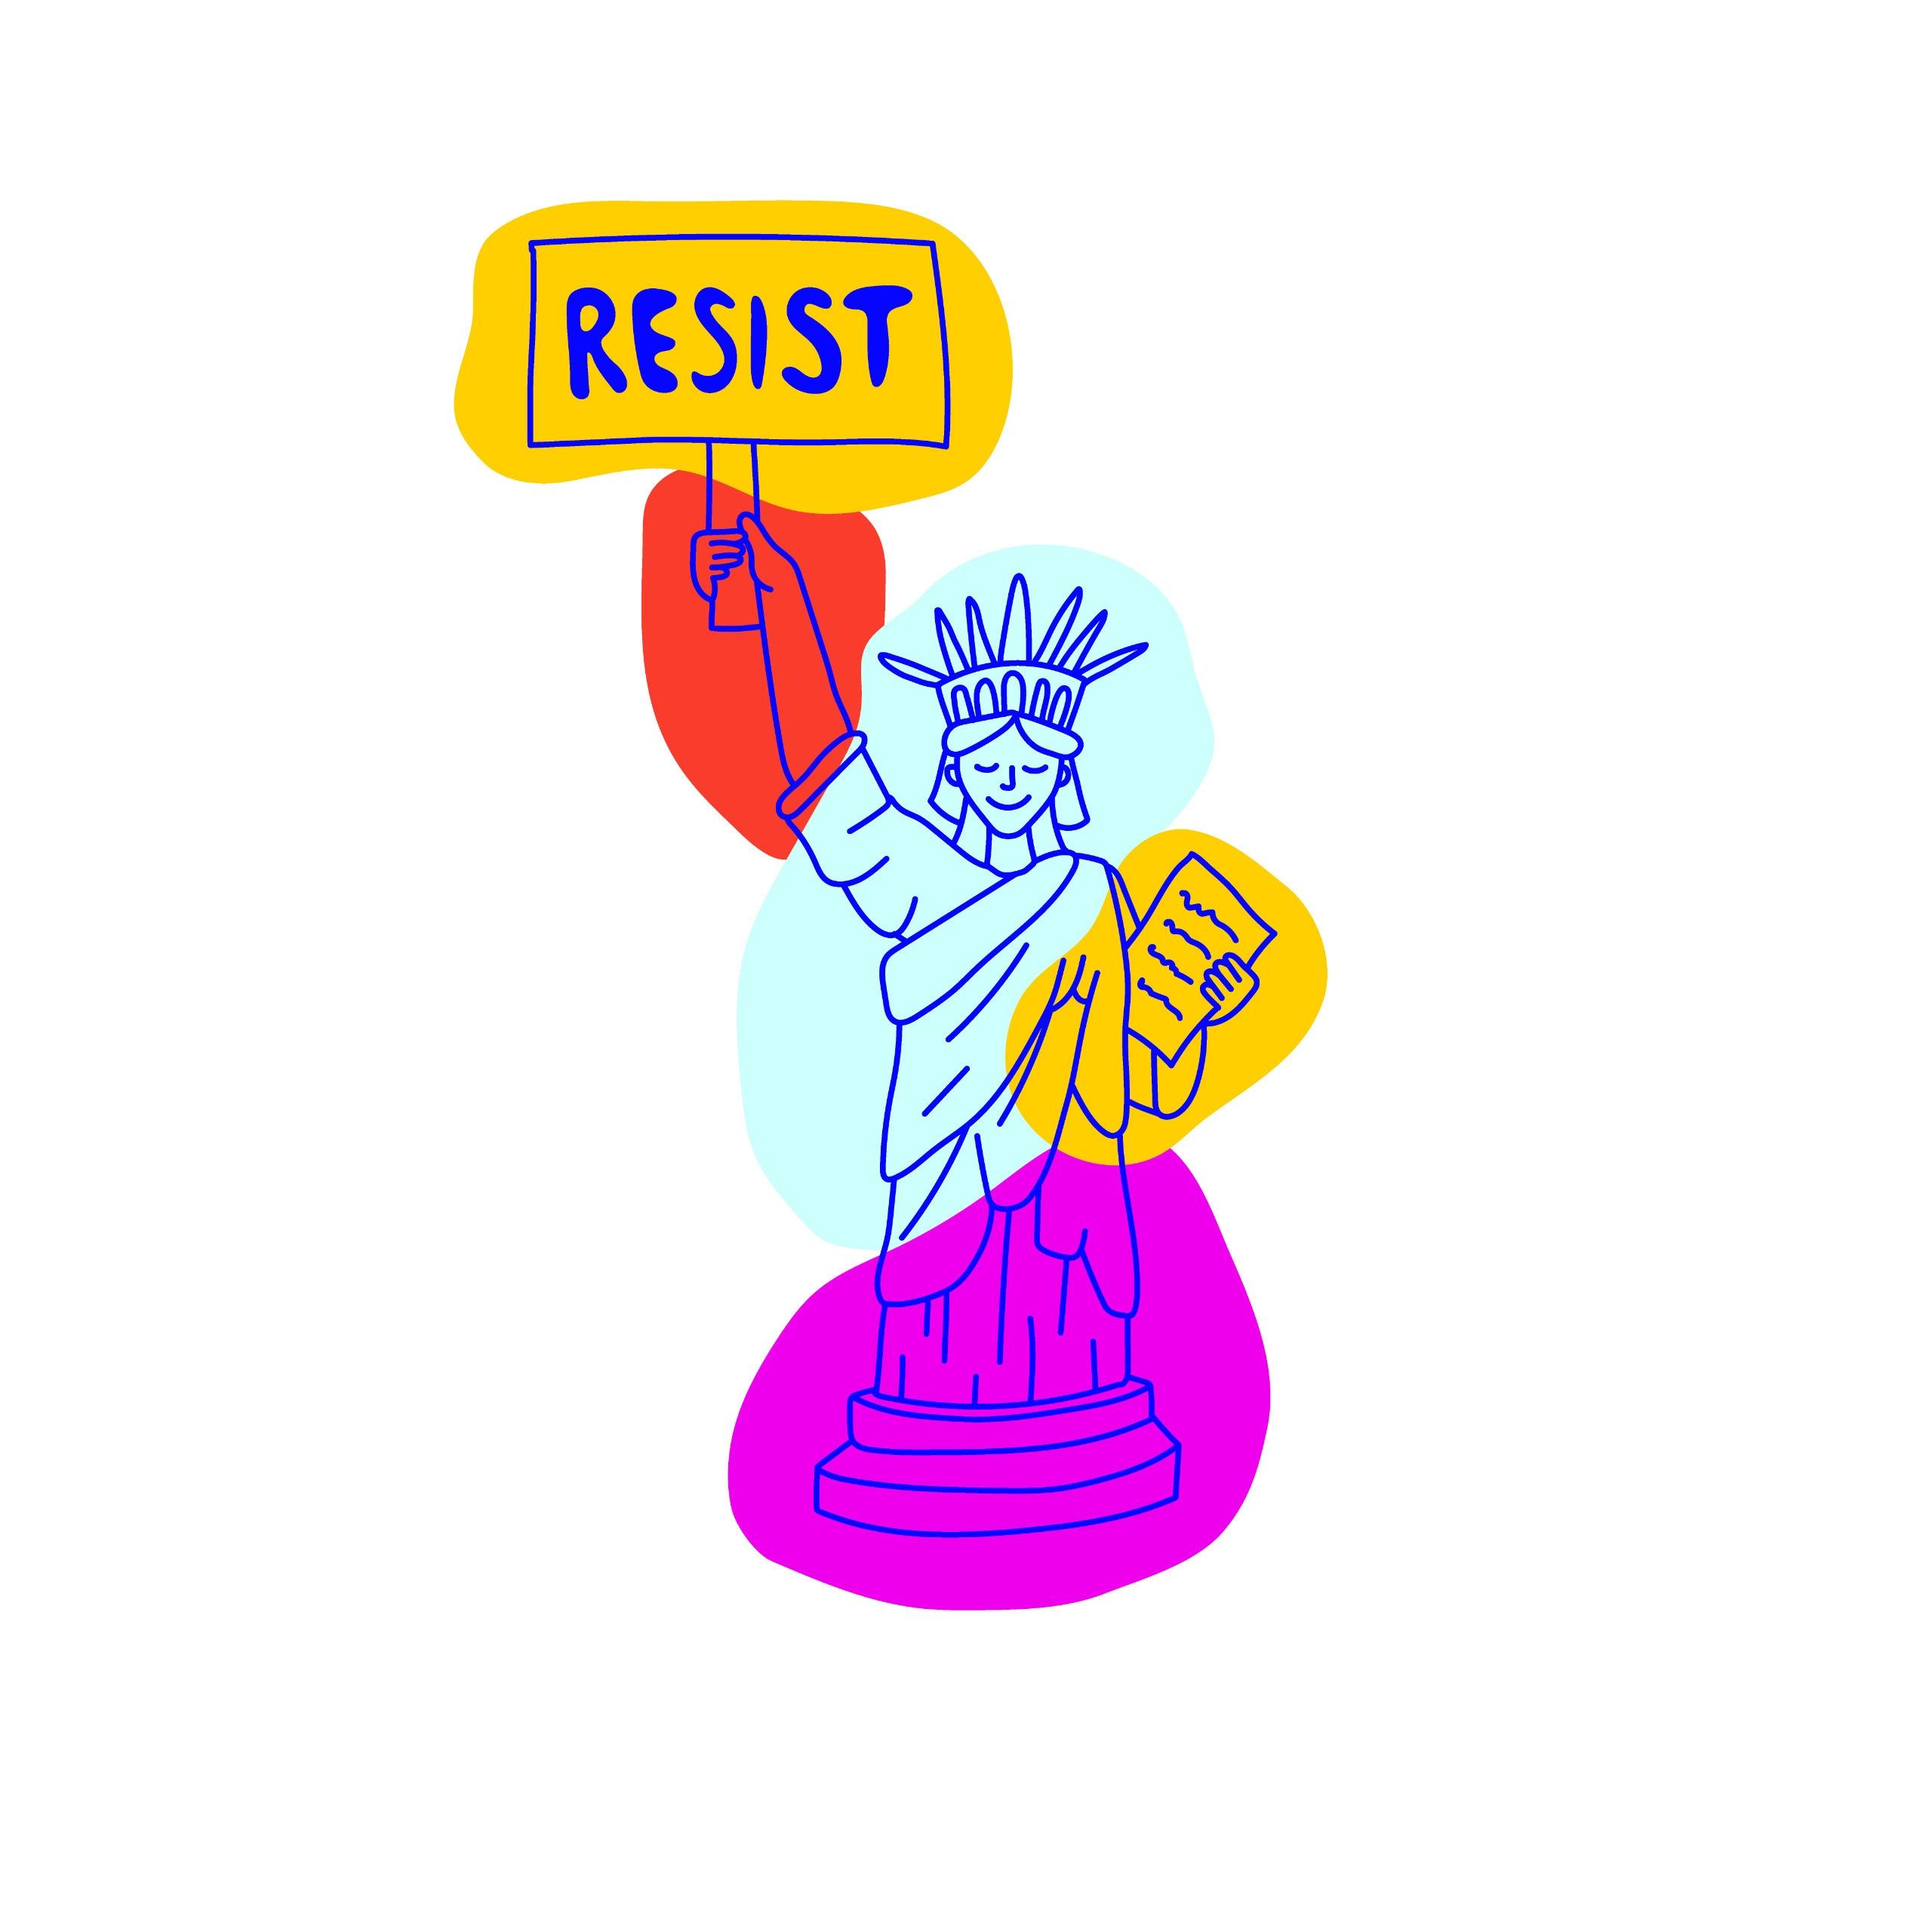 United States Resist American s - heybop | ello